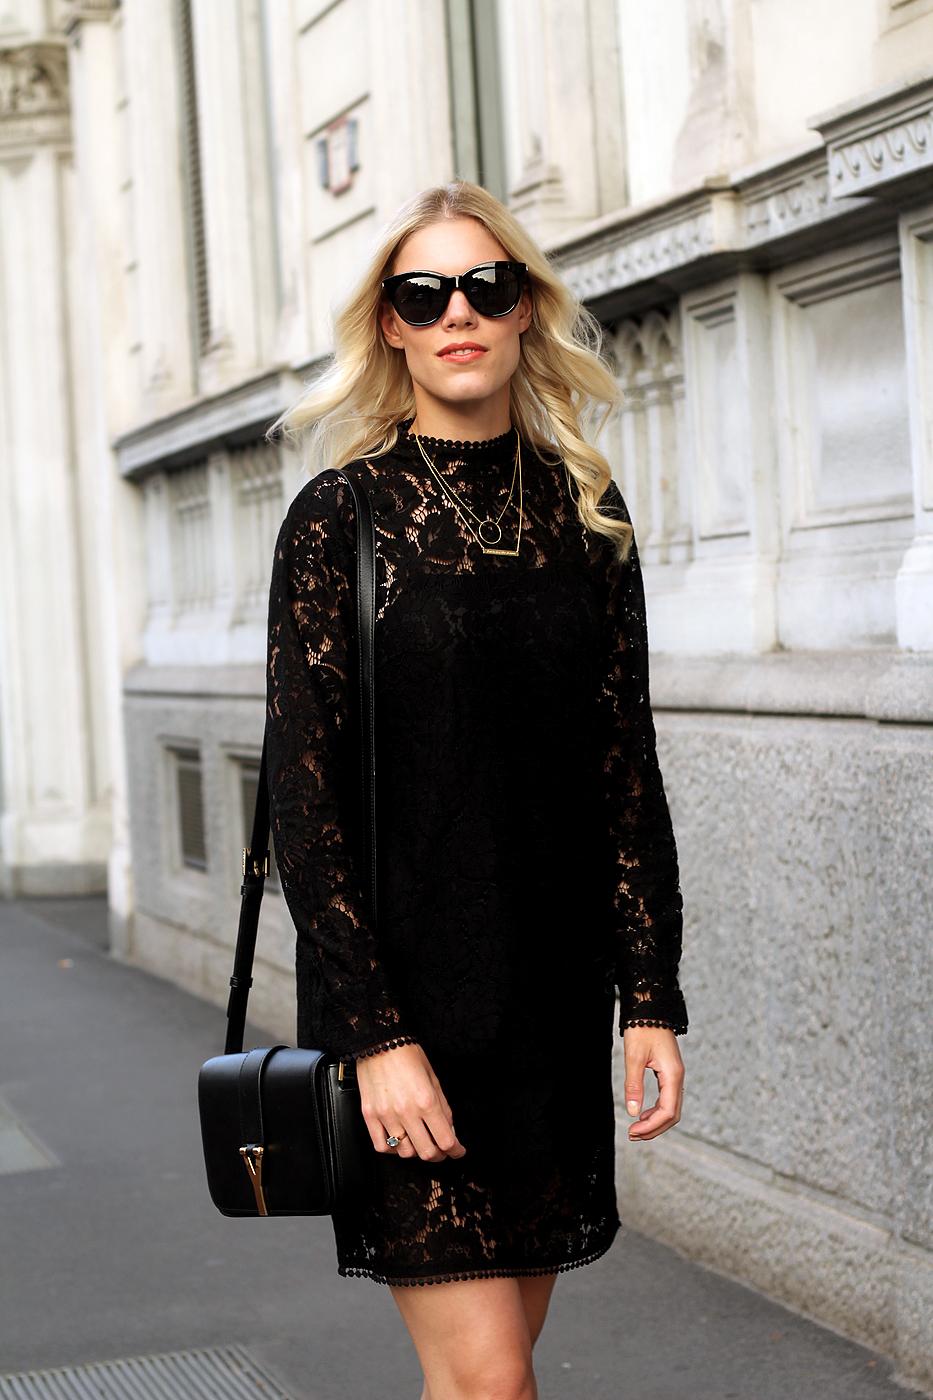 hm-dress_verena_fashionblog_somehappyshoes